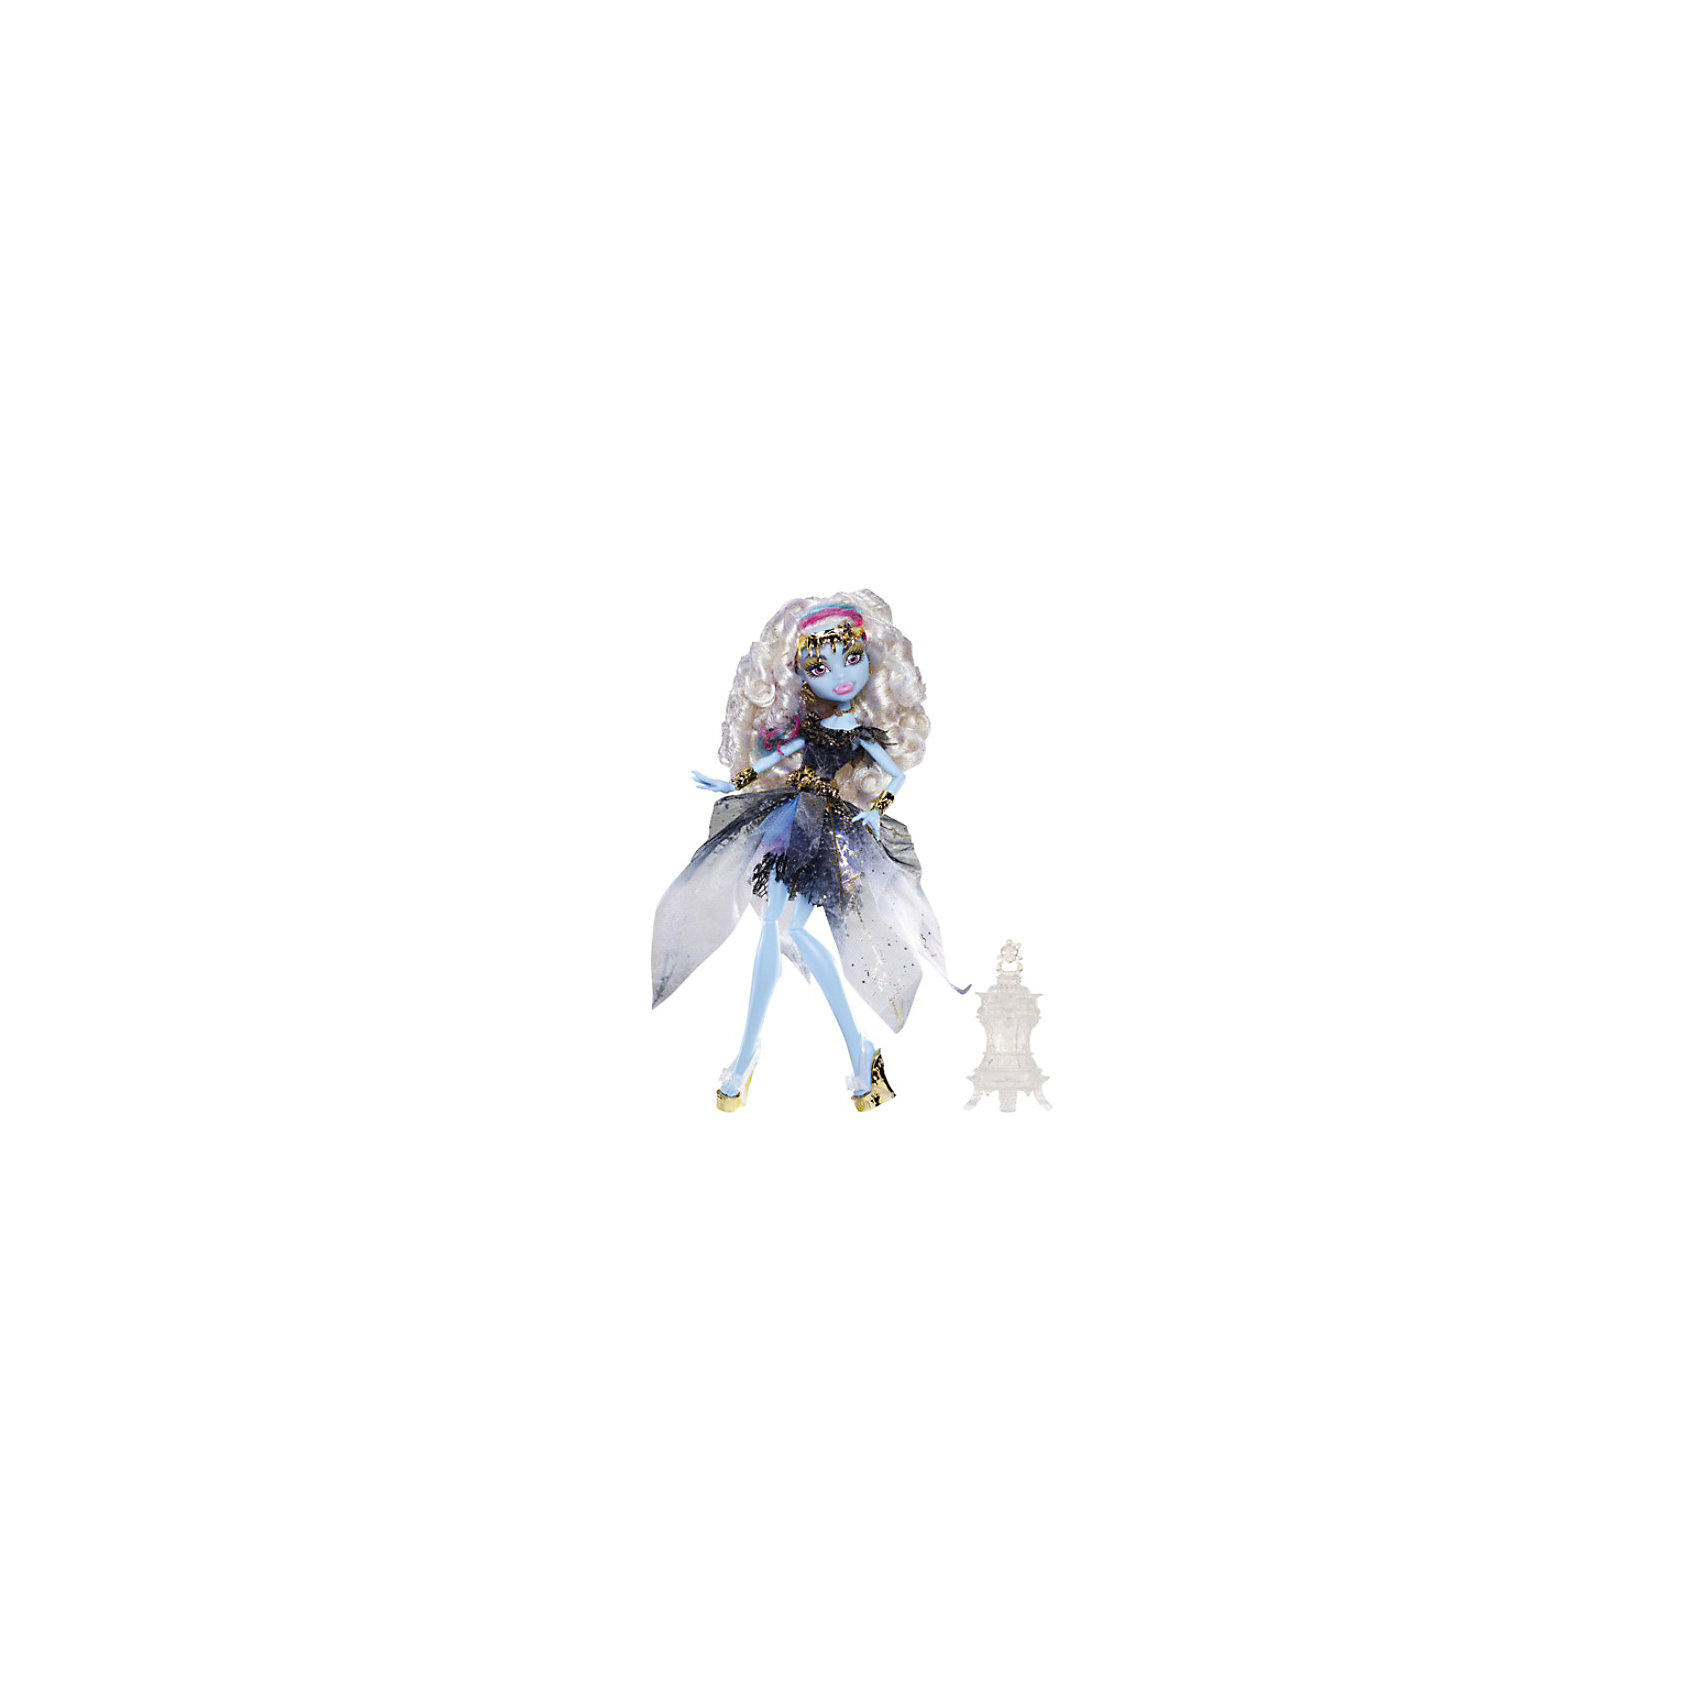 Кукла Эбби Боминейбл 13 Желаний - Марокканская вечеринка, Monster High